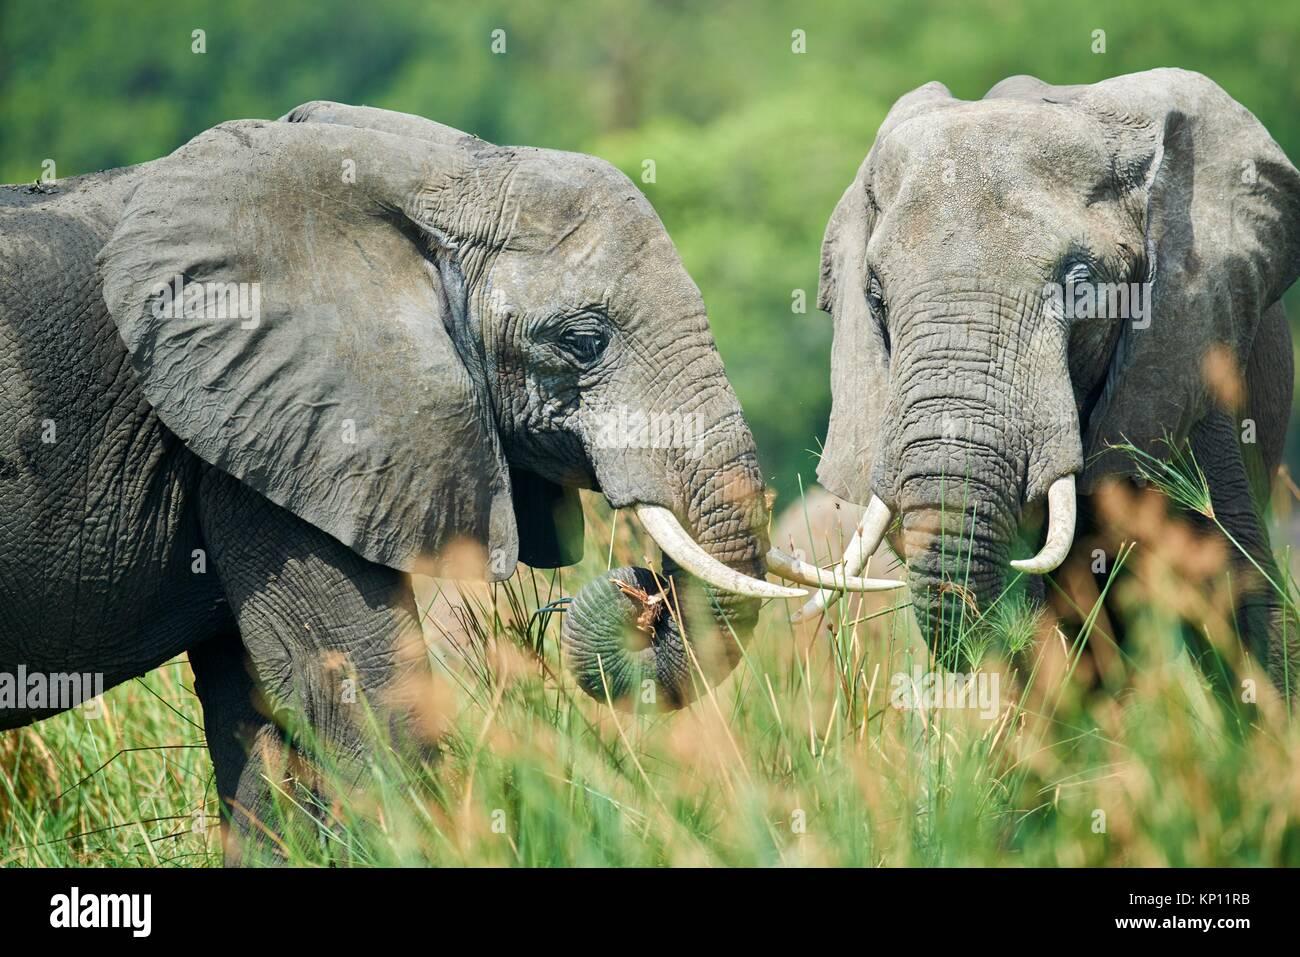 Afrikanischer Elefant (Loxodonta africana) Ernährung auf die Vegetation. Murchisson Falls Nationalpark, Uganda. Stockbild